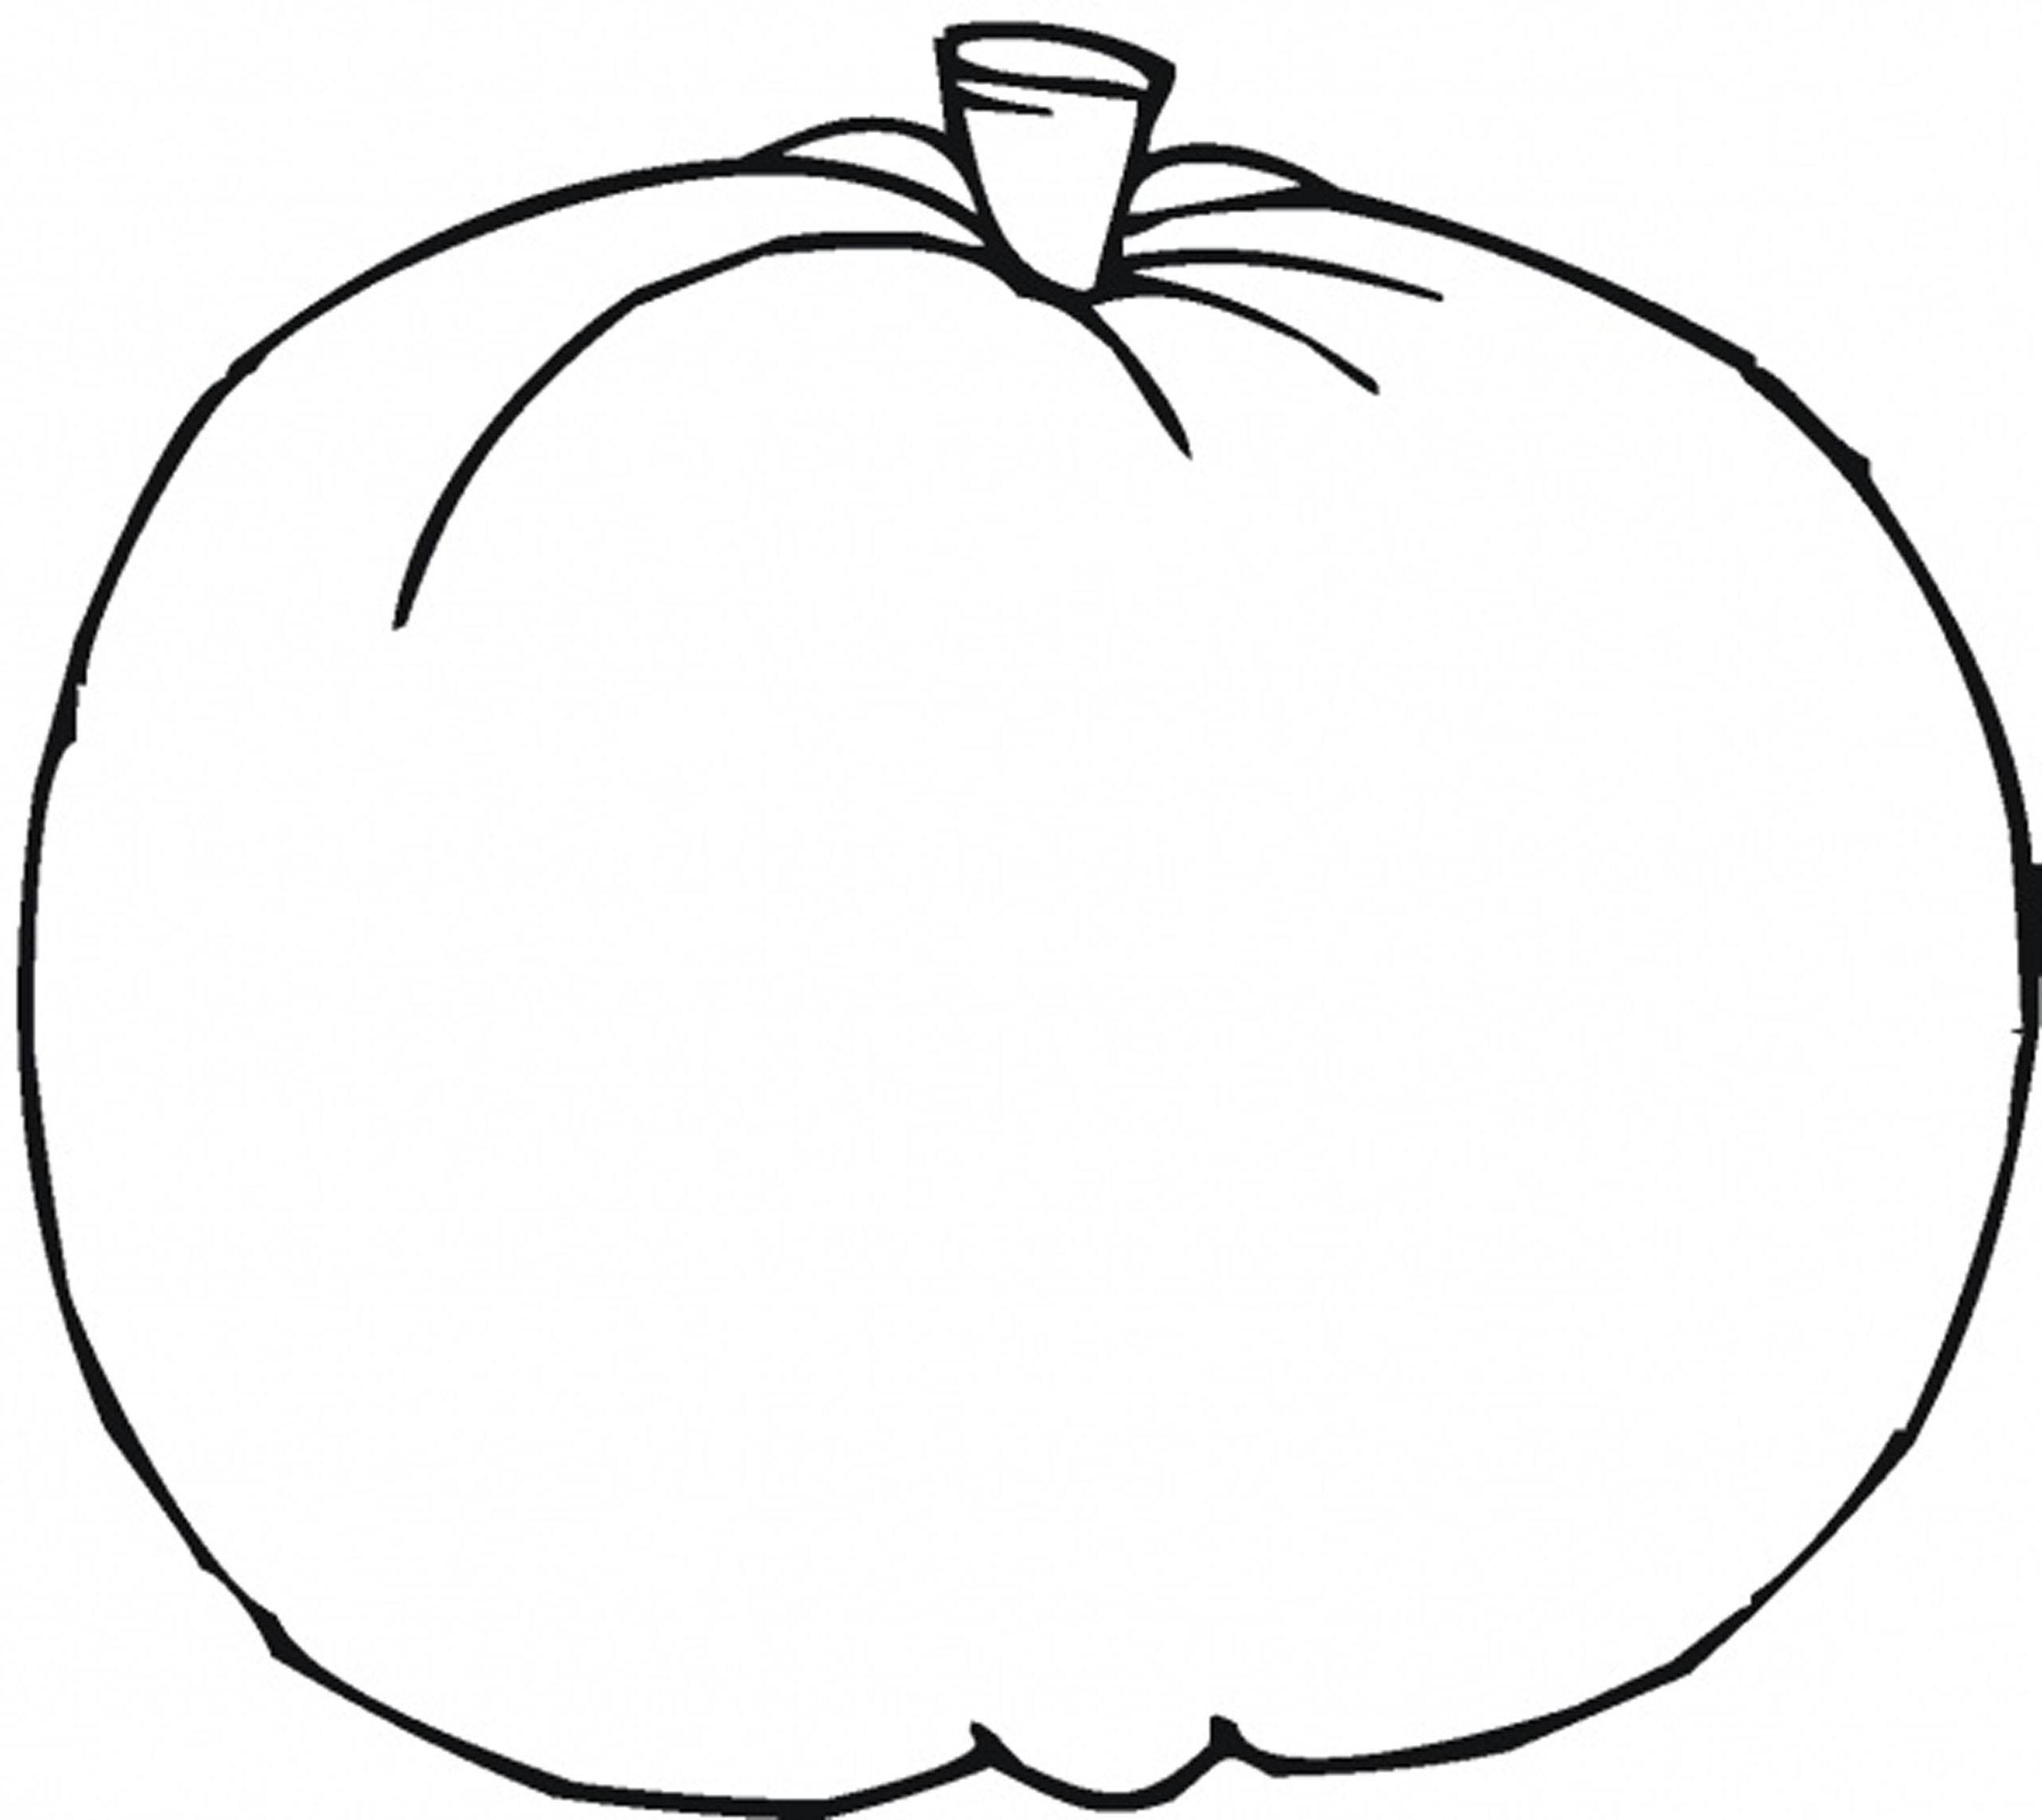 Free Pumpkin Coloring Pages Preschoolers At Getdrawings Free Download